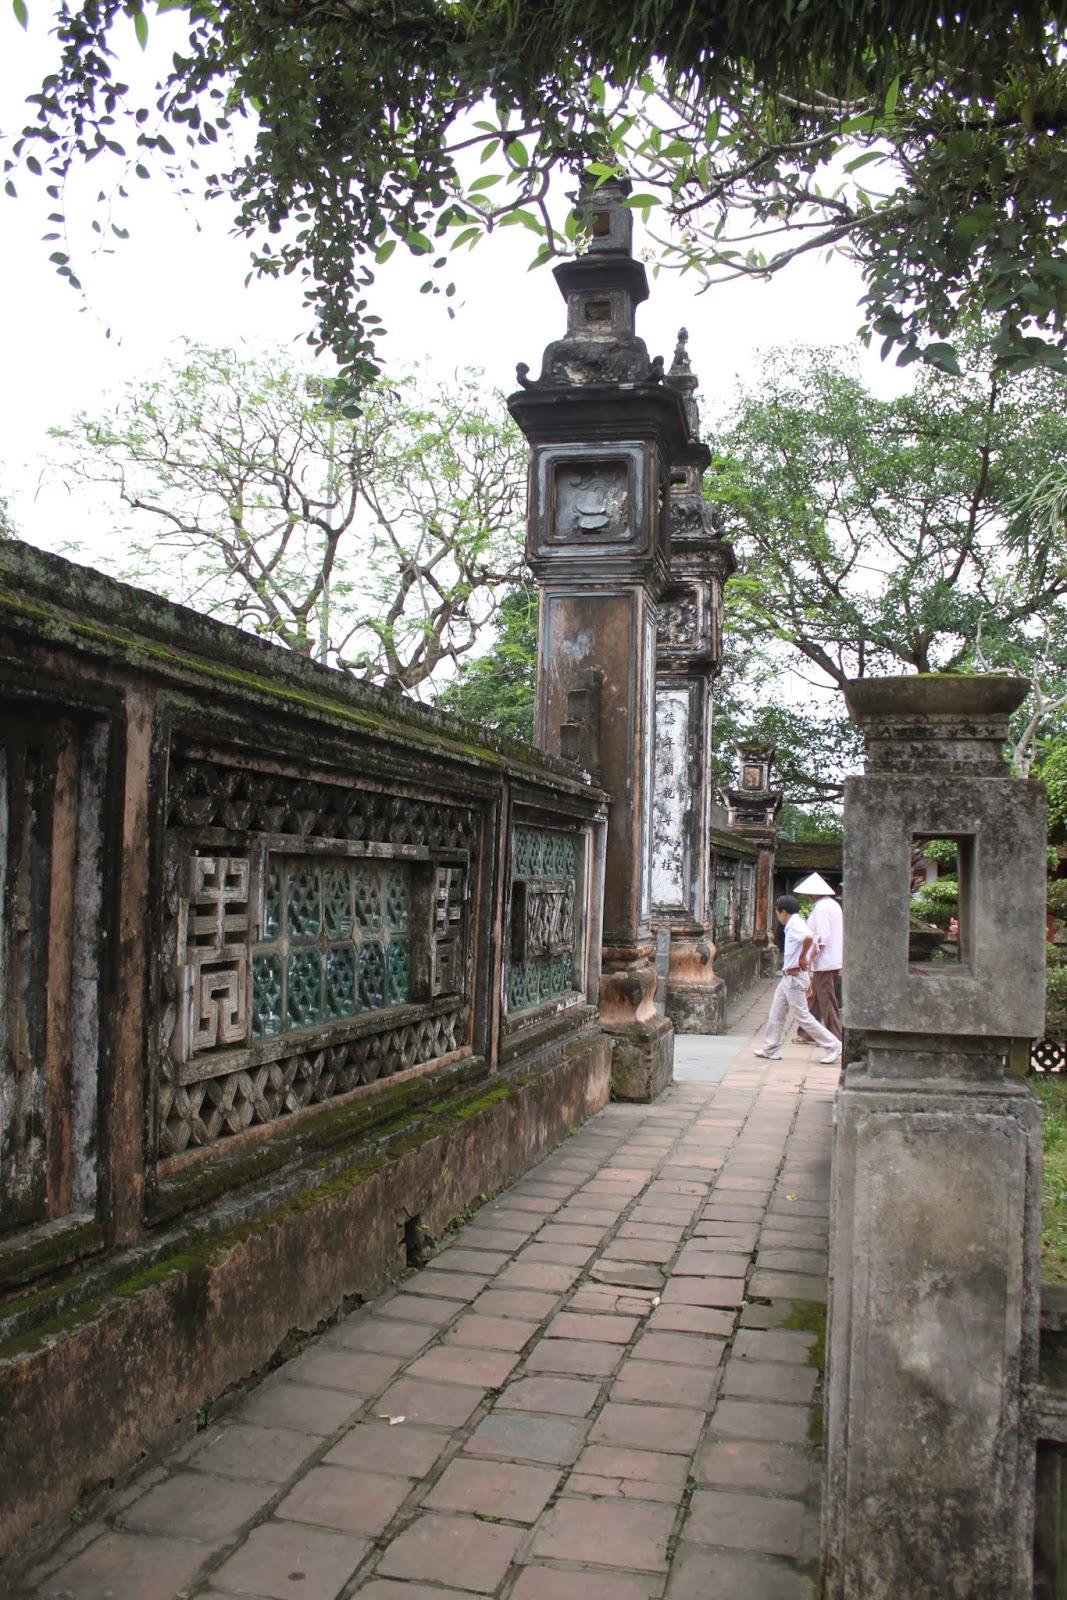 Unique design structure around King Dinh Temple at Hoa Lu capital in Vietnam